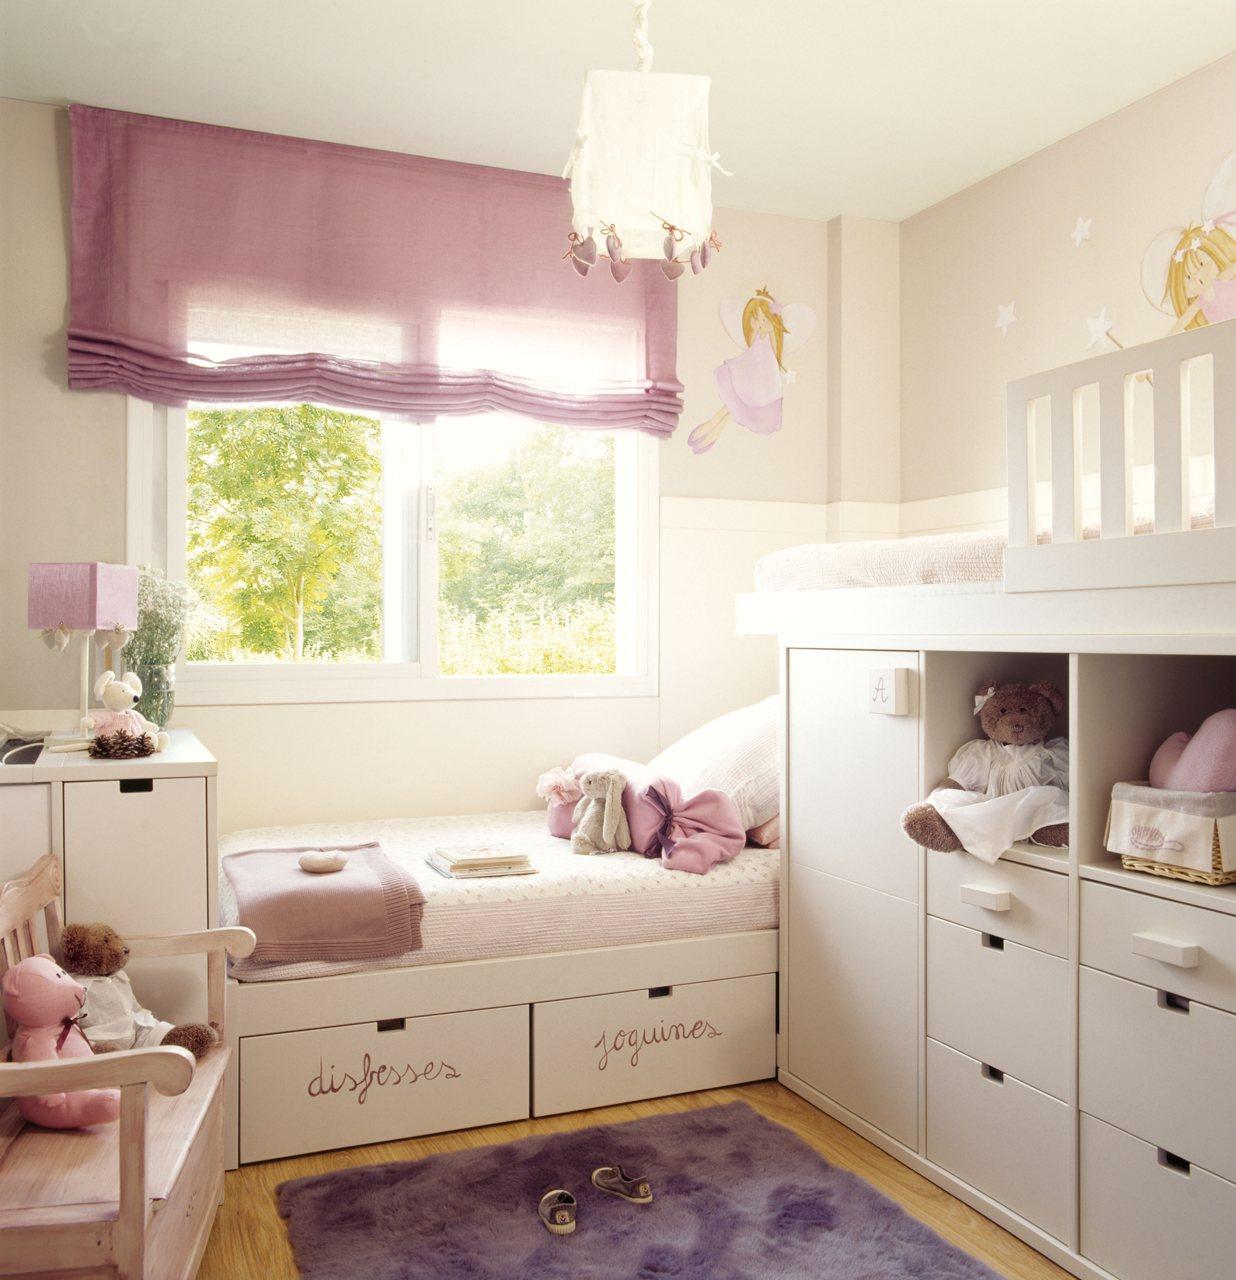 Dormitorios infantiles peque os s cales partido - Como amueblar un dormitorio pequeno ...